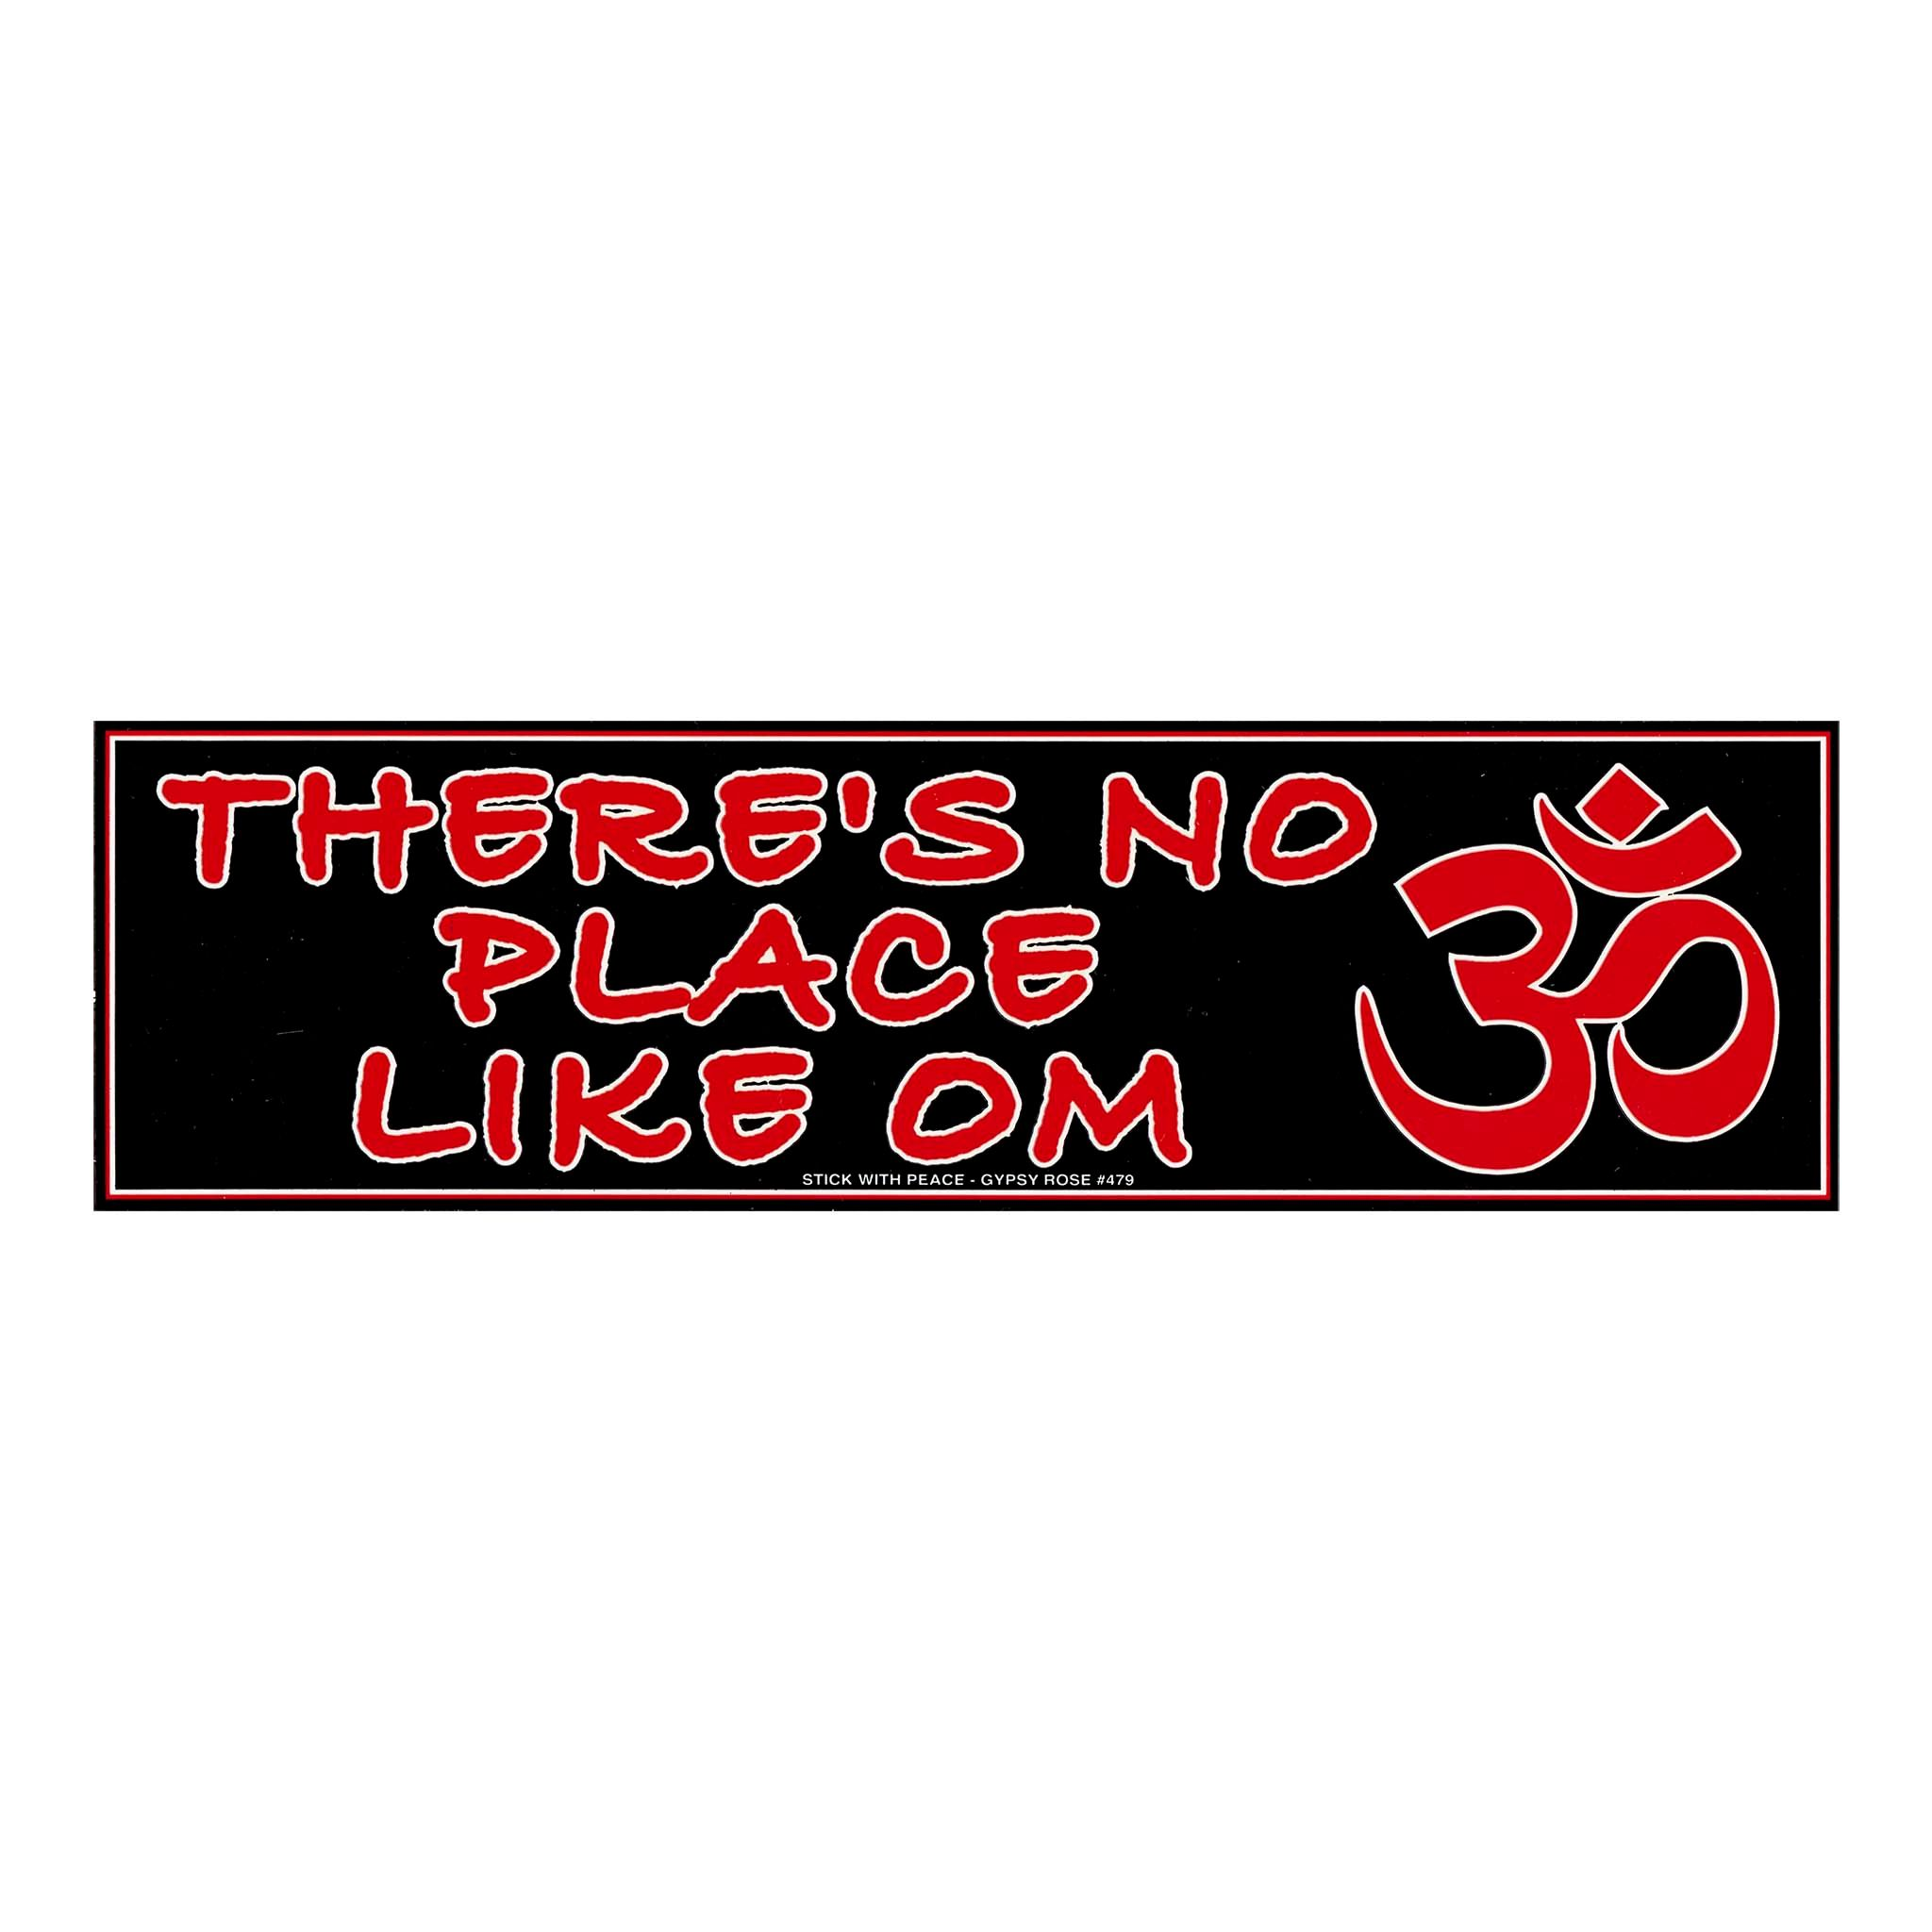 There S No Place Like Om Http Www Hippieshop Com Cgi Bin Gold Item 29648 Om Noplacelikeom Yoga Yogi Medita Funny Bumper Stickers Stickers Om Symbol [ 2048 x 2048 Pixel ]